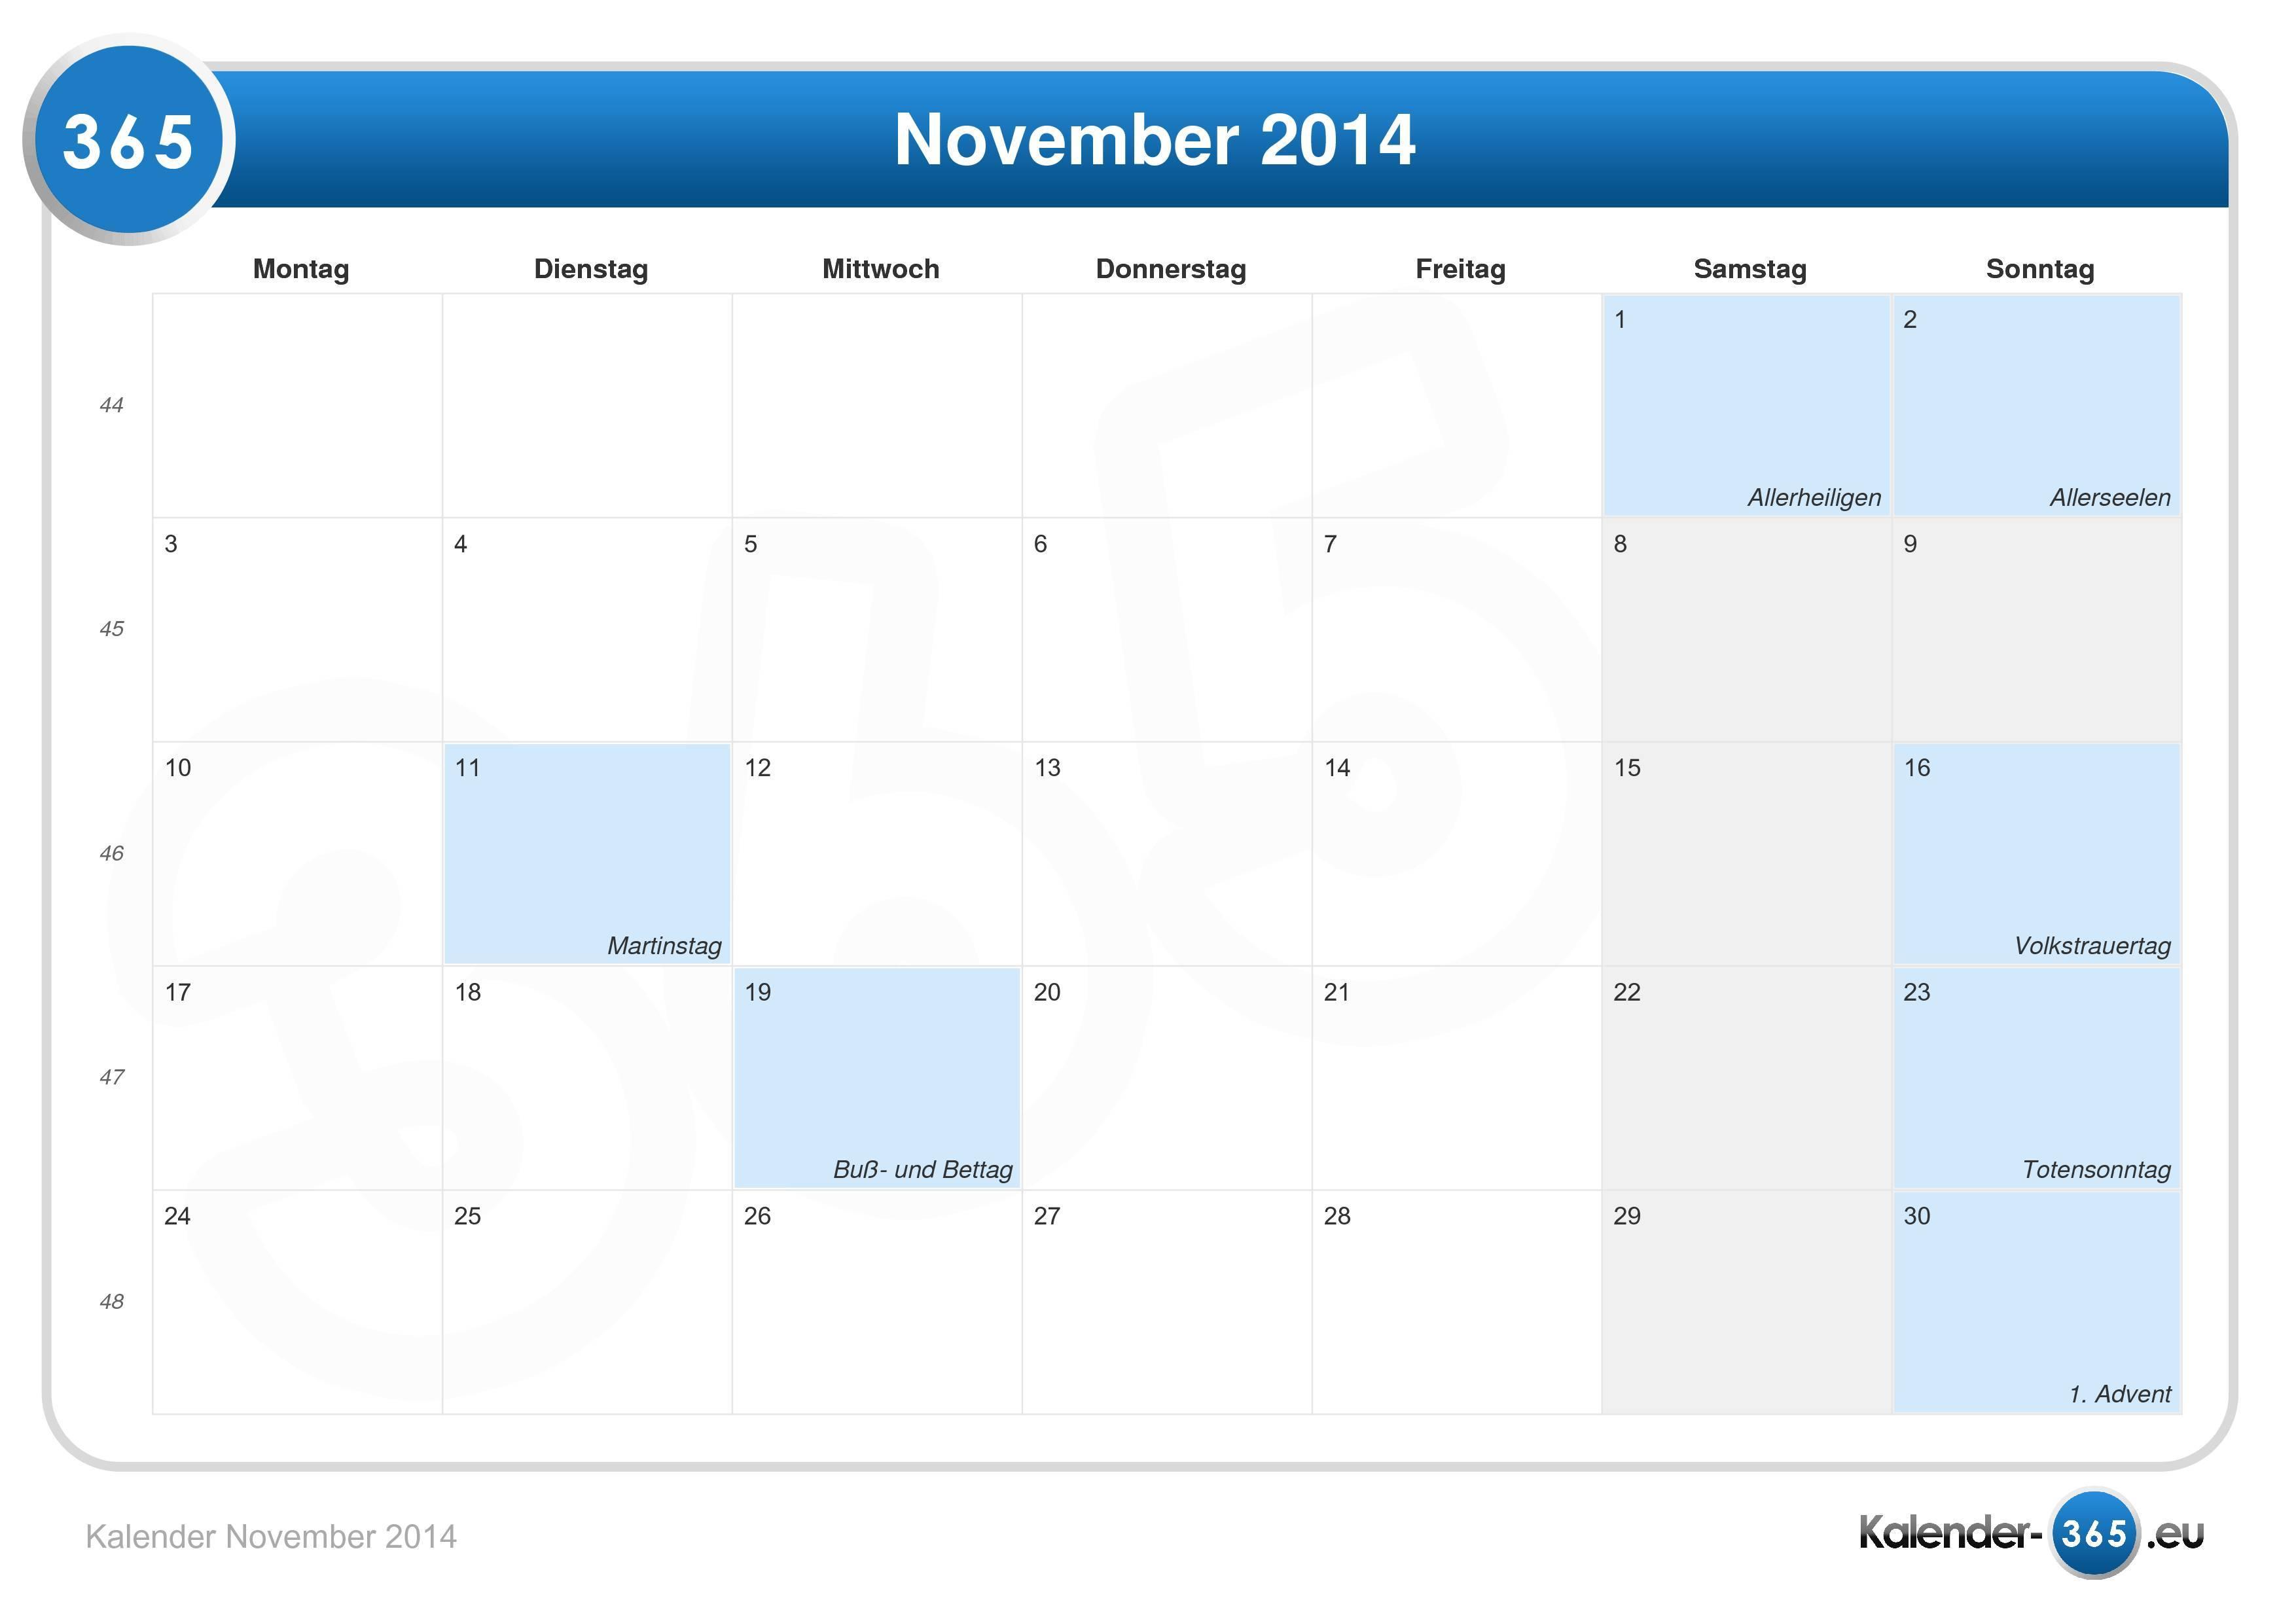 Kalender November 2014